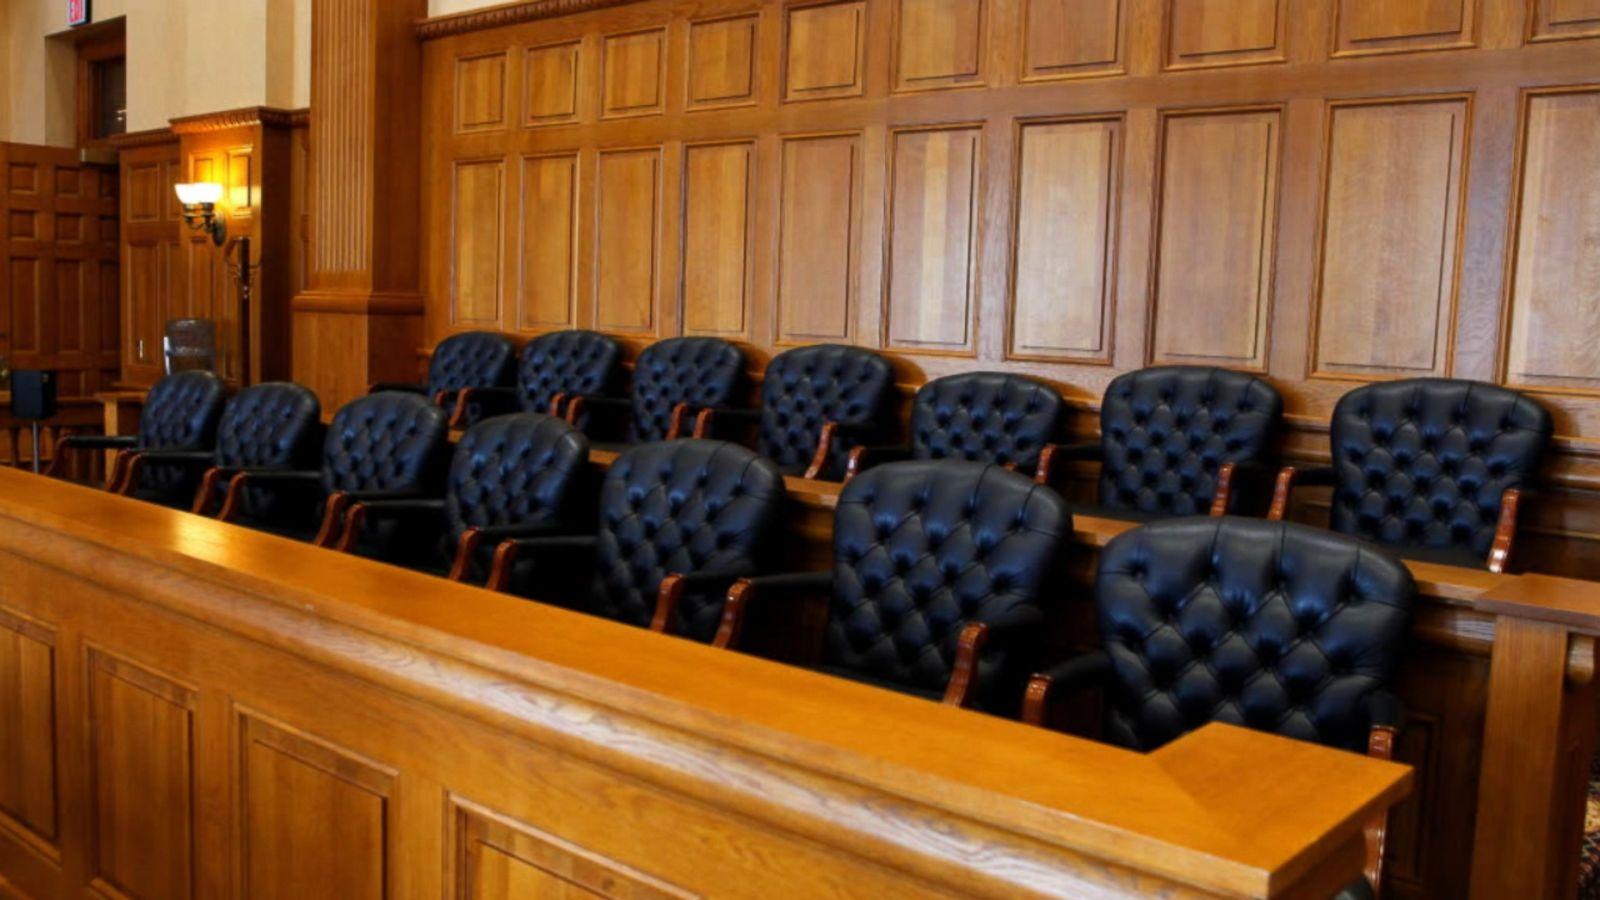 Grand Jury Duty Post Mortem